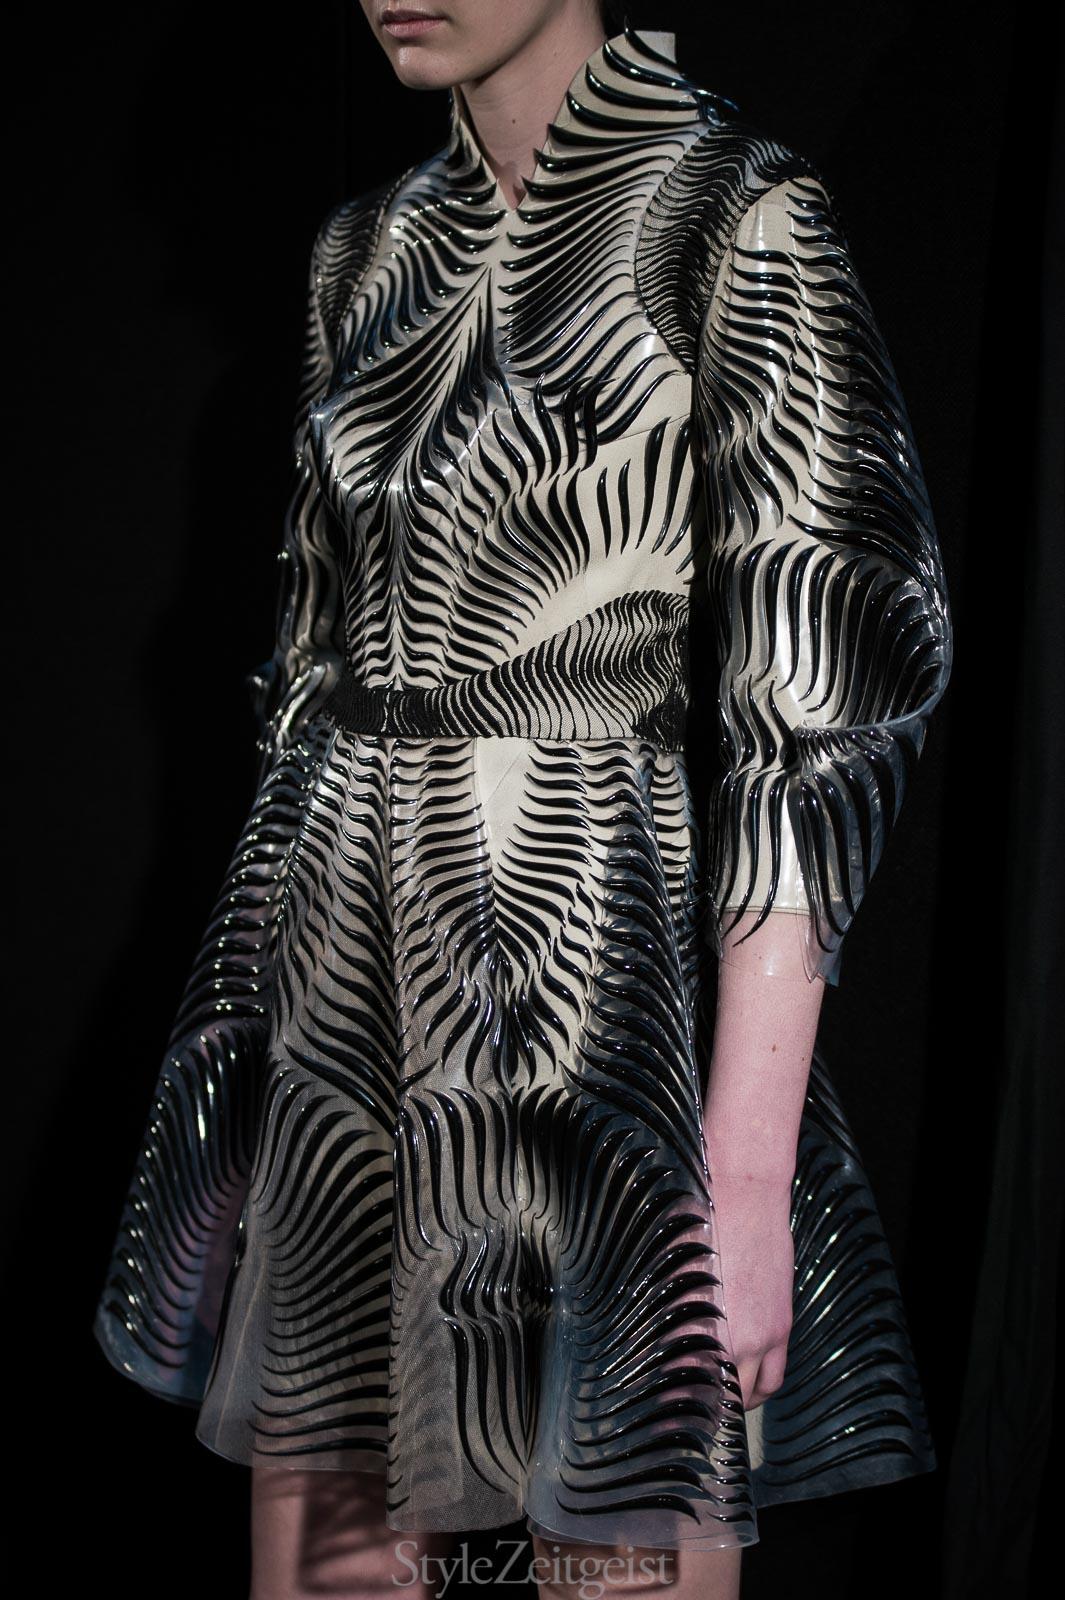 Iris van Herpen S/S17 Haute Couture - Paris - fashion - StyleZeitgeist, SS17, Spring Summer, Patrick LaDuke, Iris Van Herpen, Haute Couture, 2017